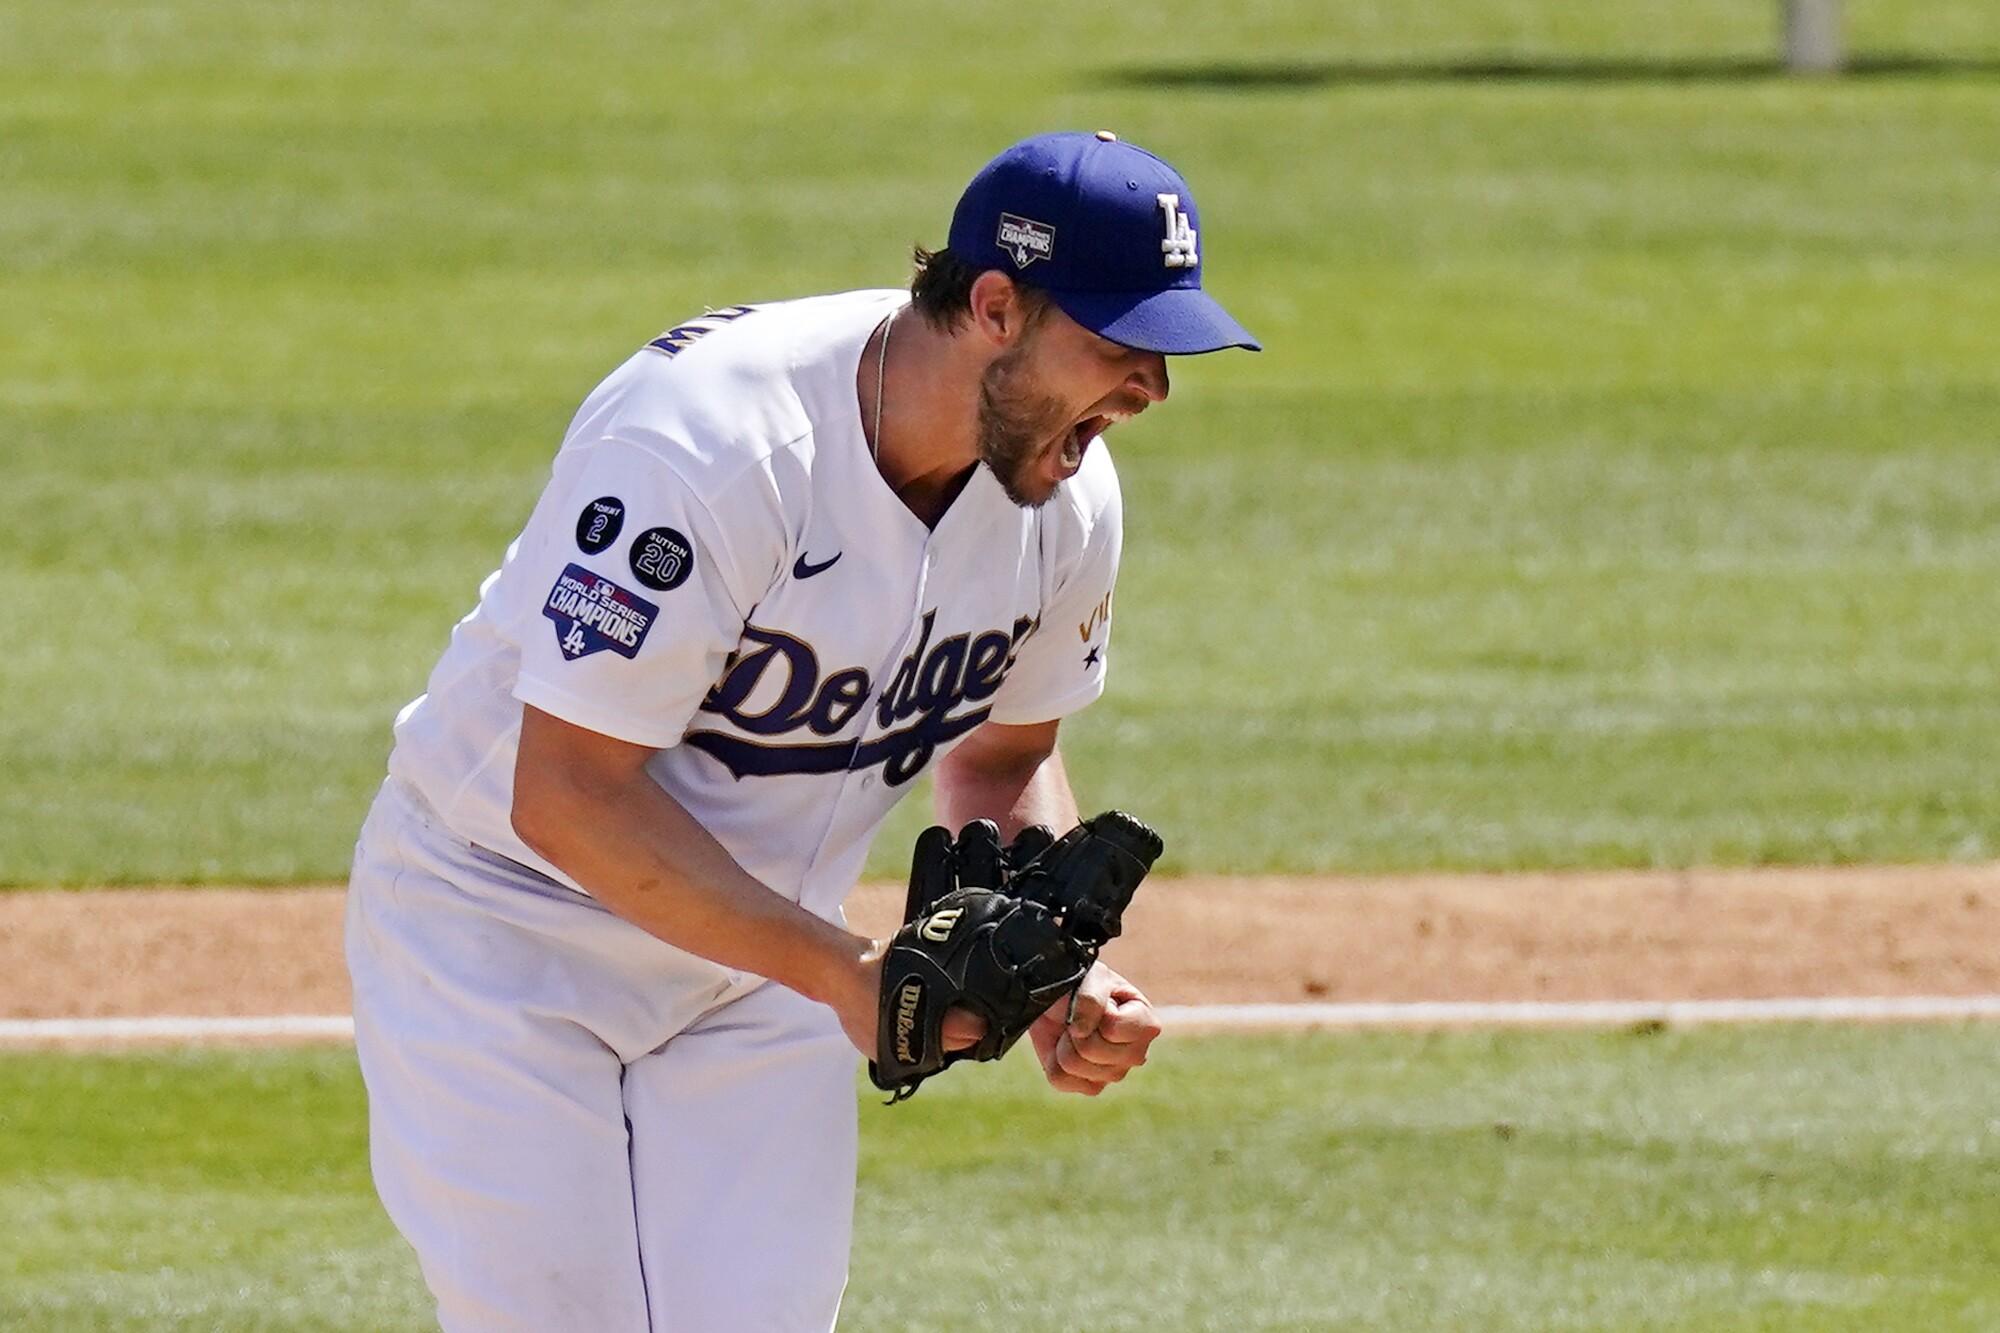 Los Angeles Dodgers starting pitcher Clayton Kershaw celebrates after striking out Washington Nationals' Jordy Mercer.